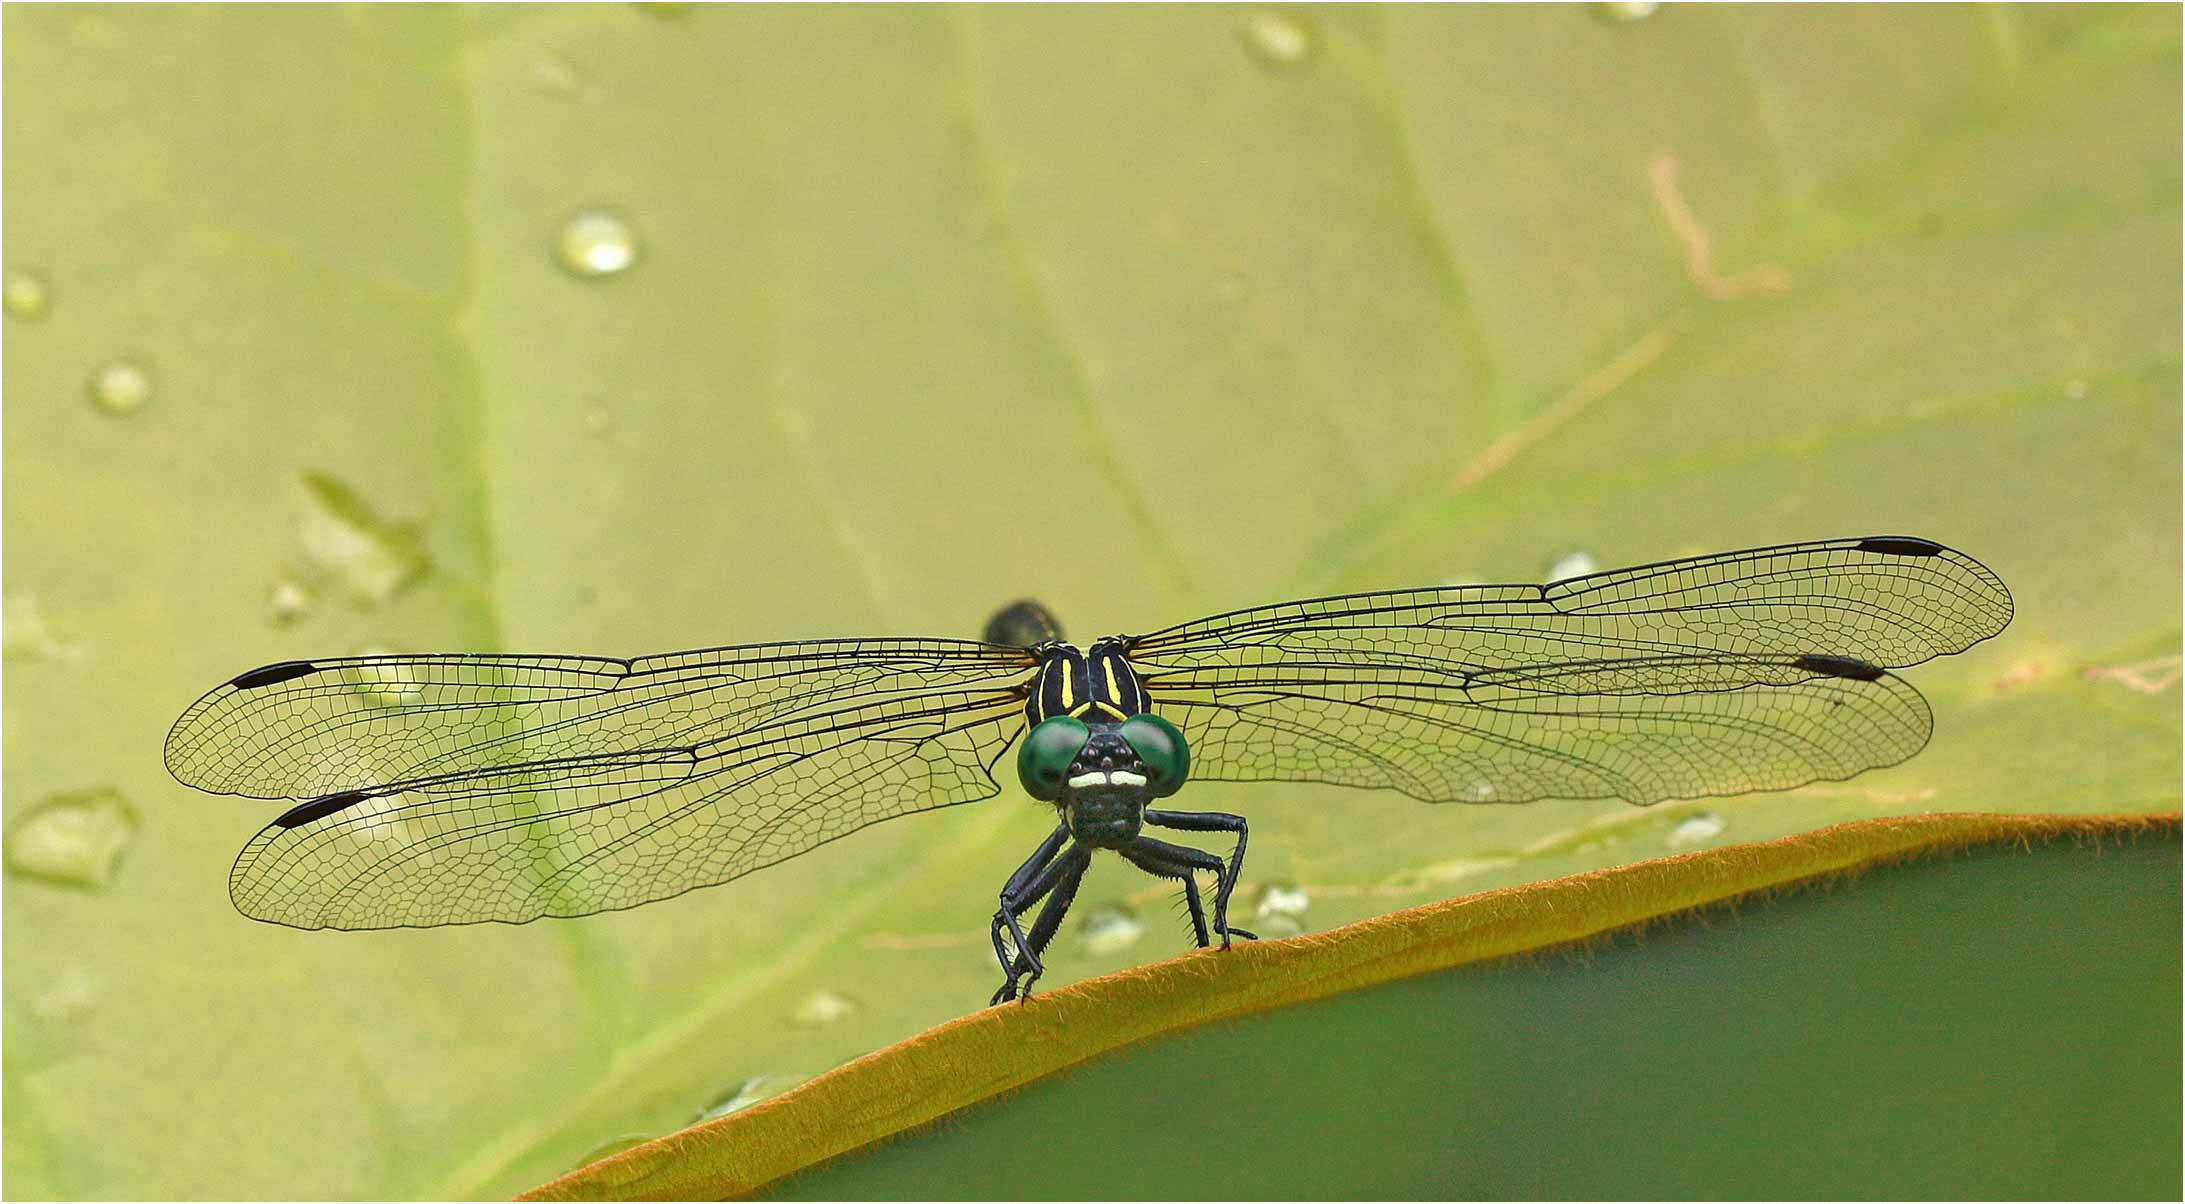 Leptogomphus sp. mâle, Vietnam, Pia Oac, 05/06/2018